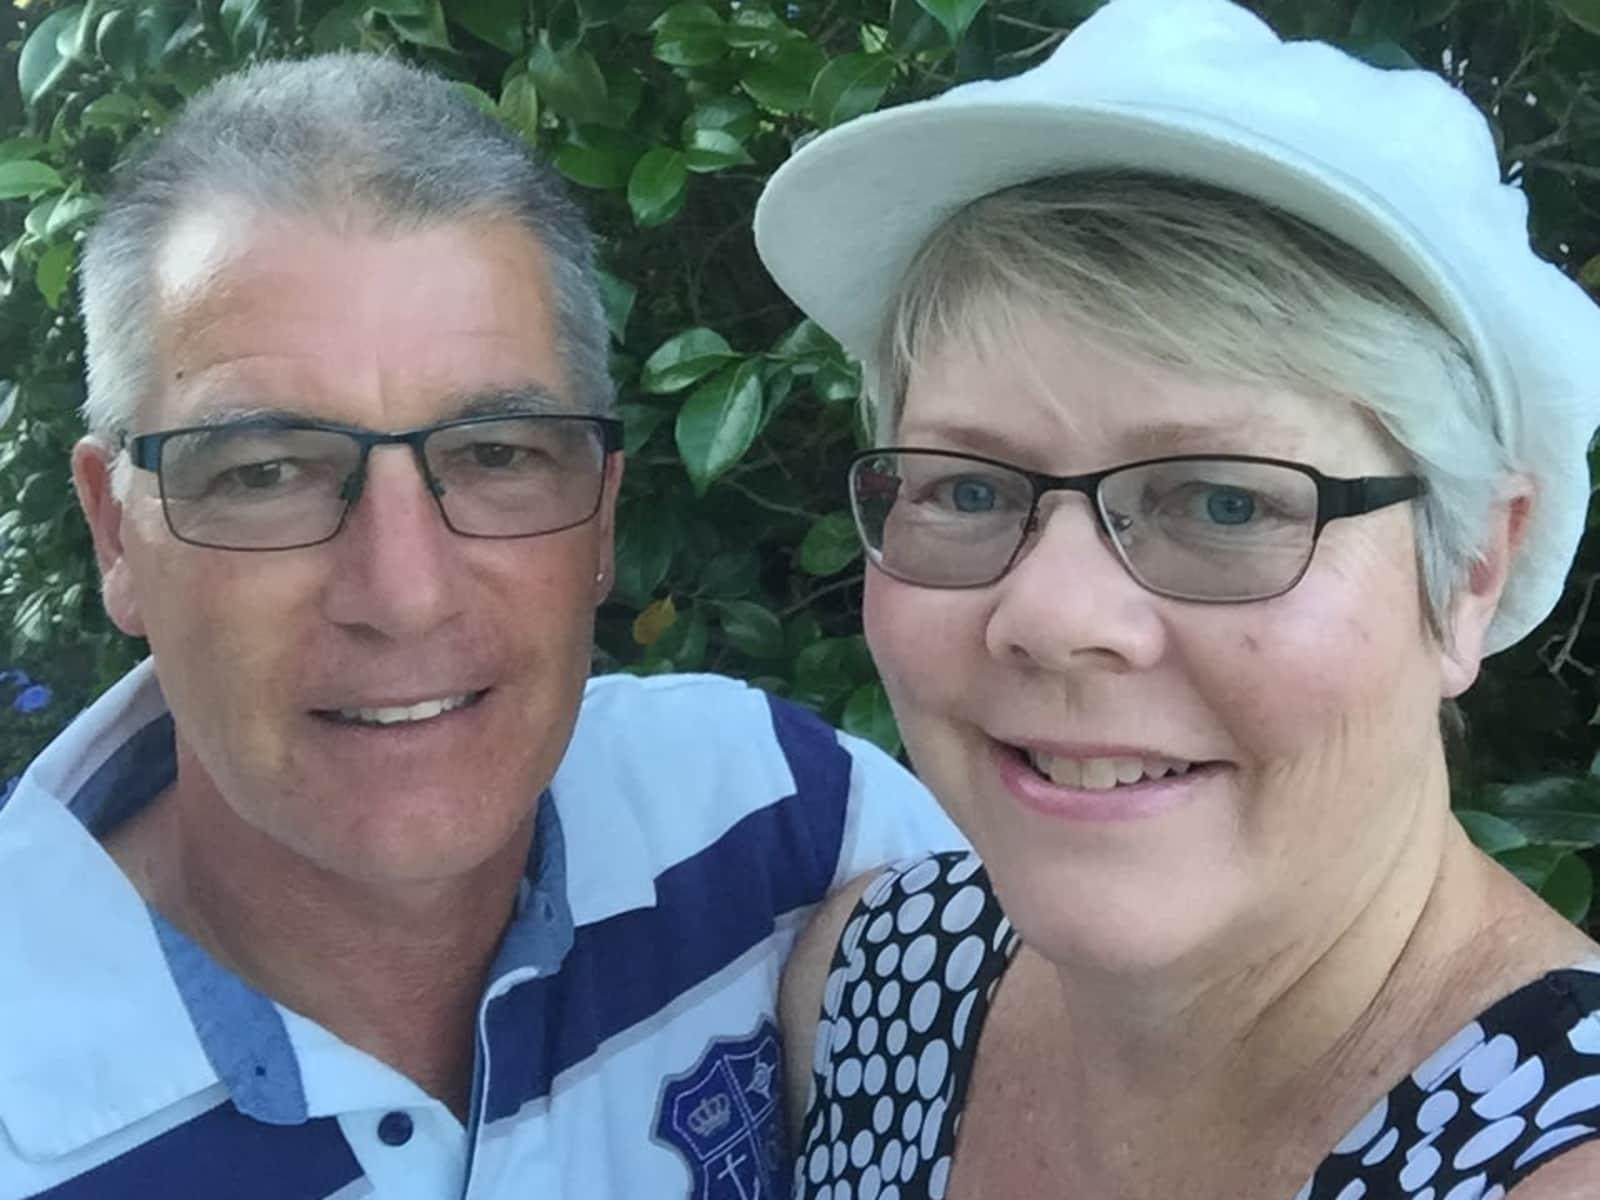 Milene & Nicolas from Napier, New Zealand